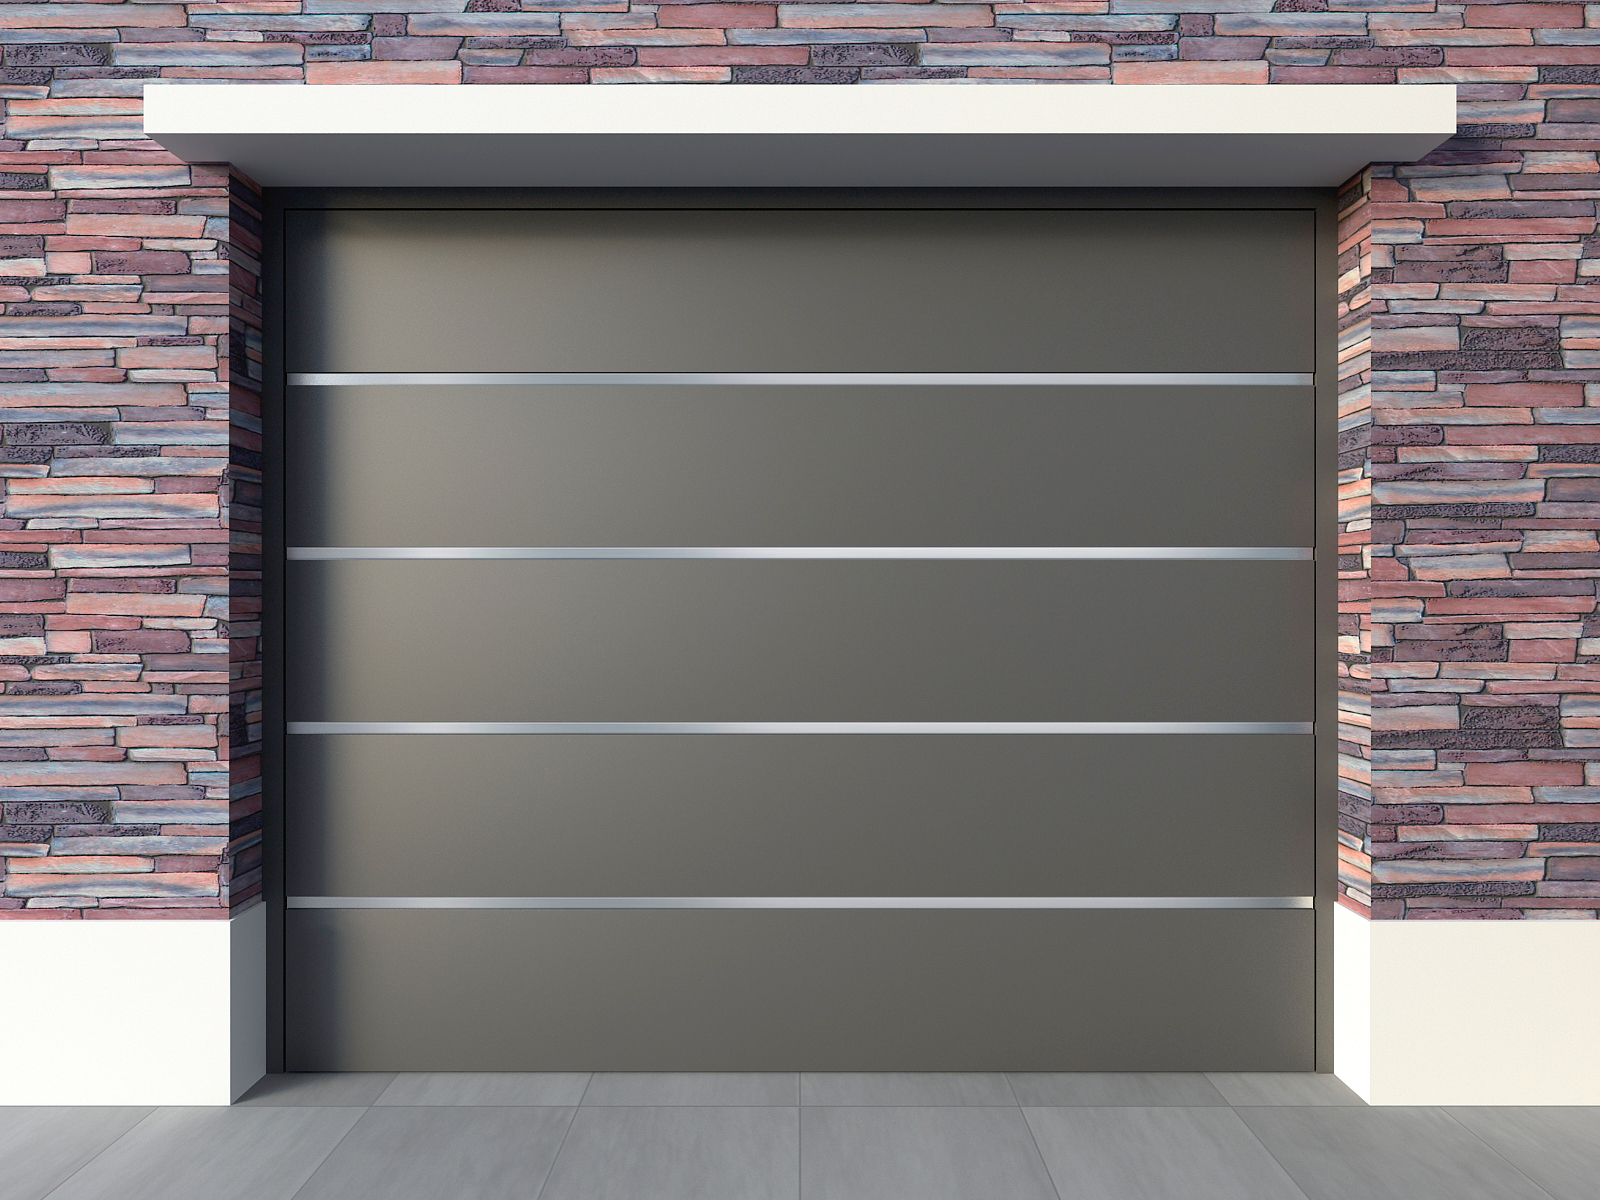 Aberturas mitre portones levadizos metalicos for Portones para garage